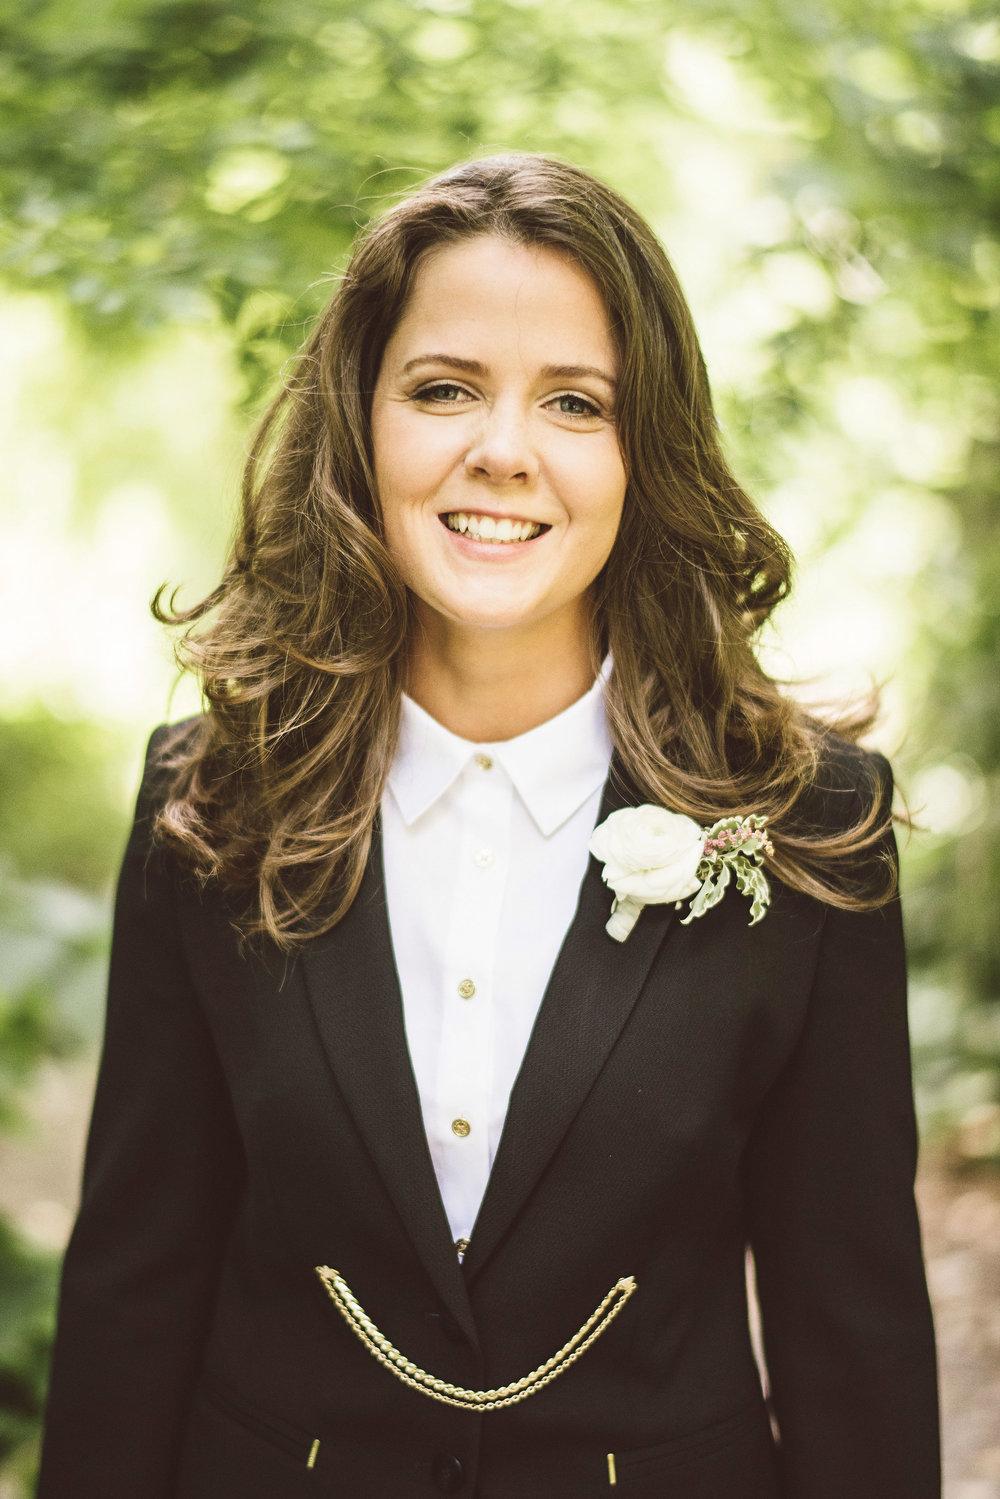 alyssa_elizabeth_machine_shop_minneapolis_wedding_by_lucas_botz_DSC_7166.jpg